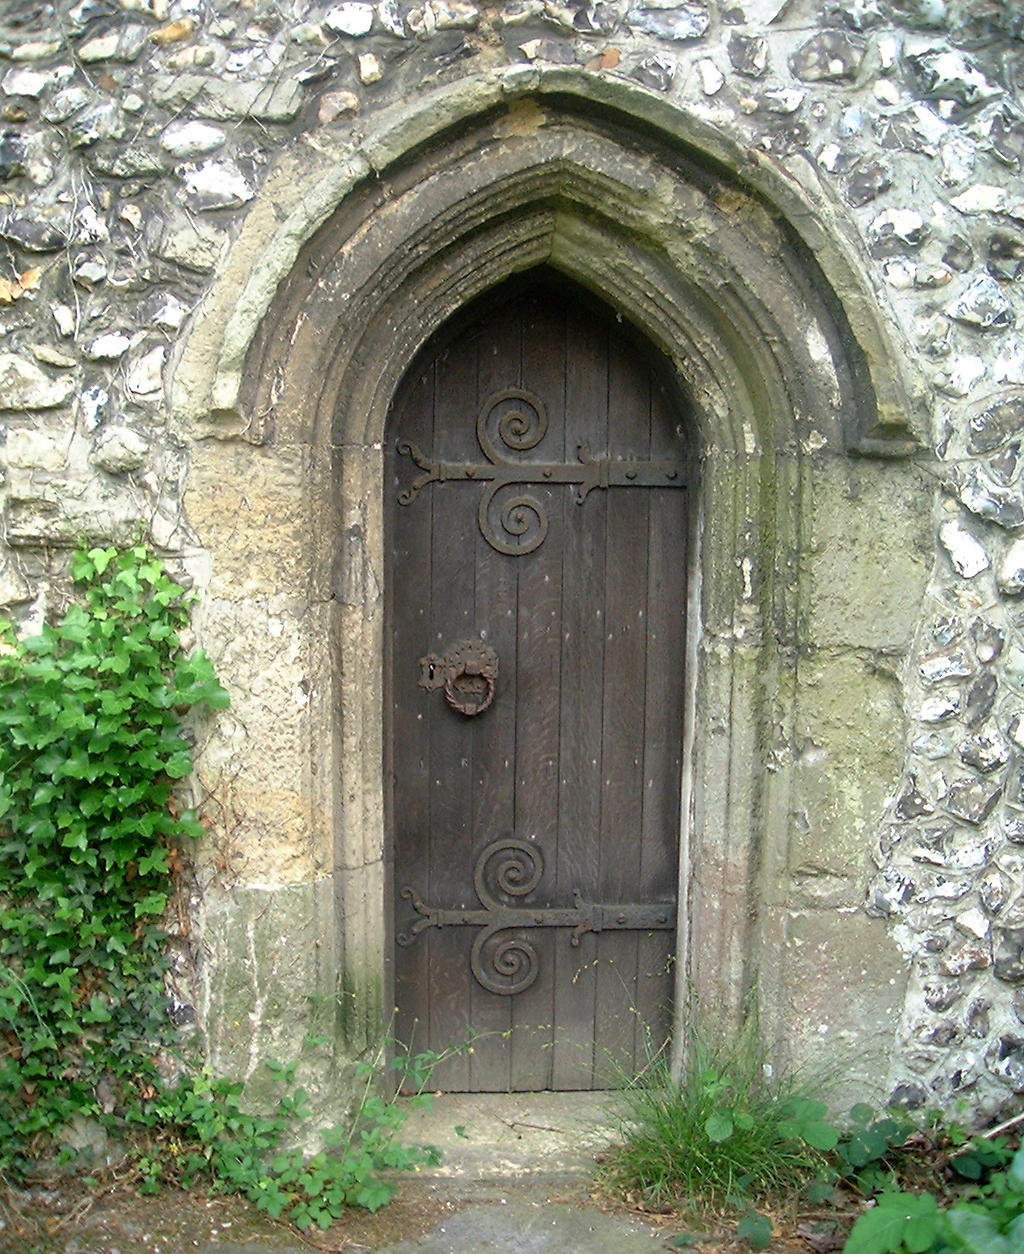 ... Secret Door 2 by tia-stock & Secret Door 2 by tia-stock on DeviantArt pezcame.com